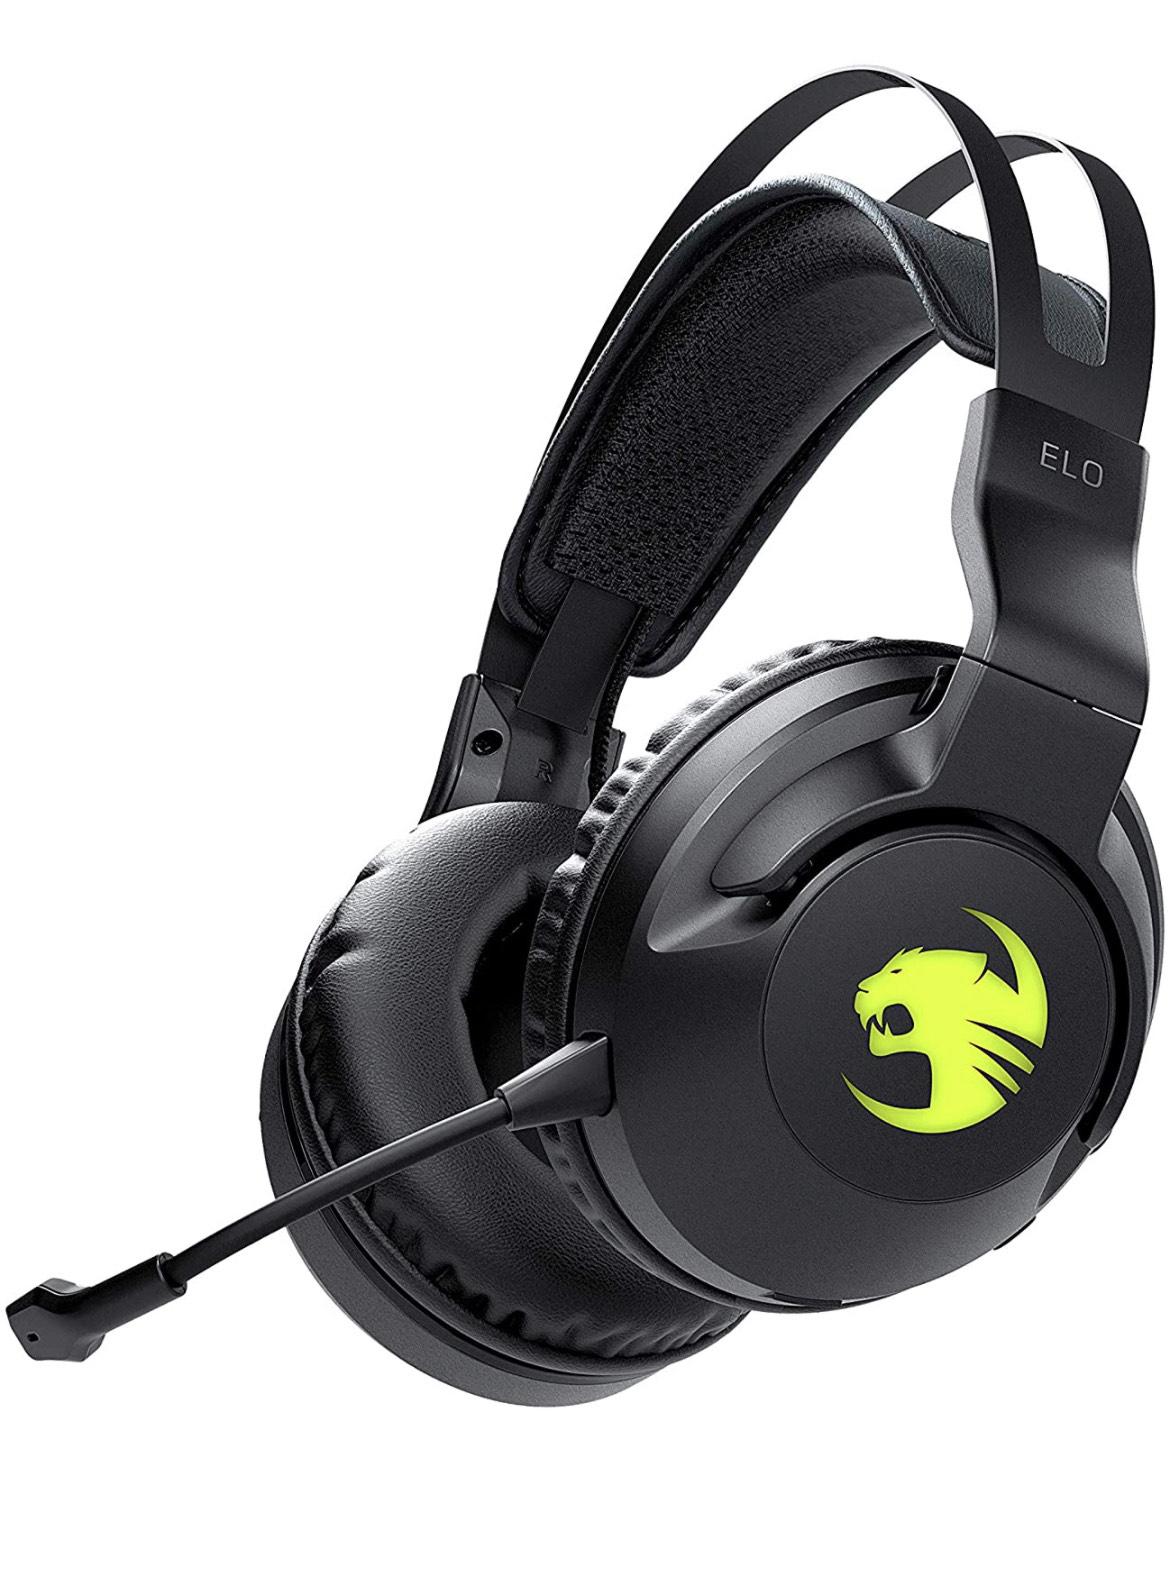 (Primeday) Roccat Elo 7.1 Wireless Gaming Headset